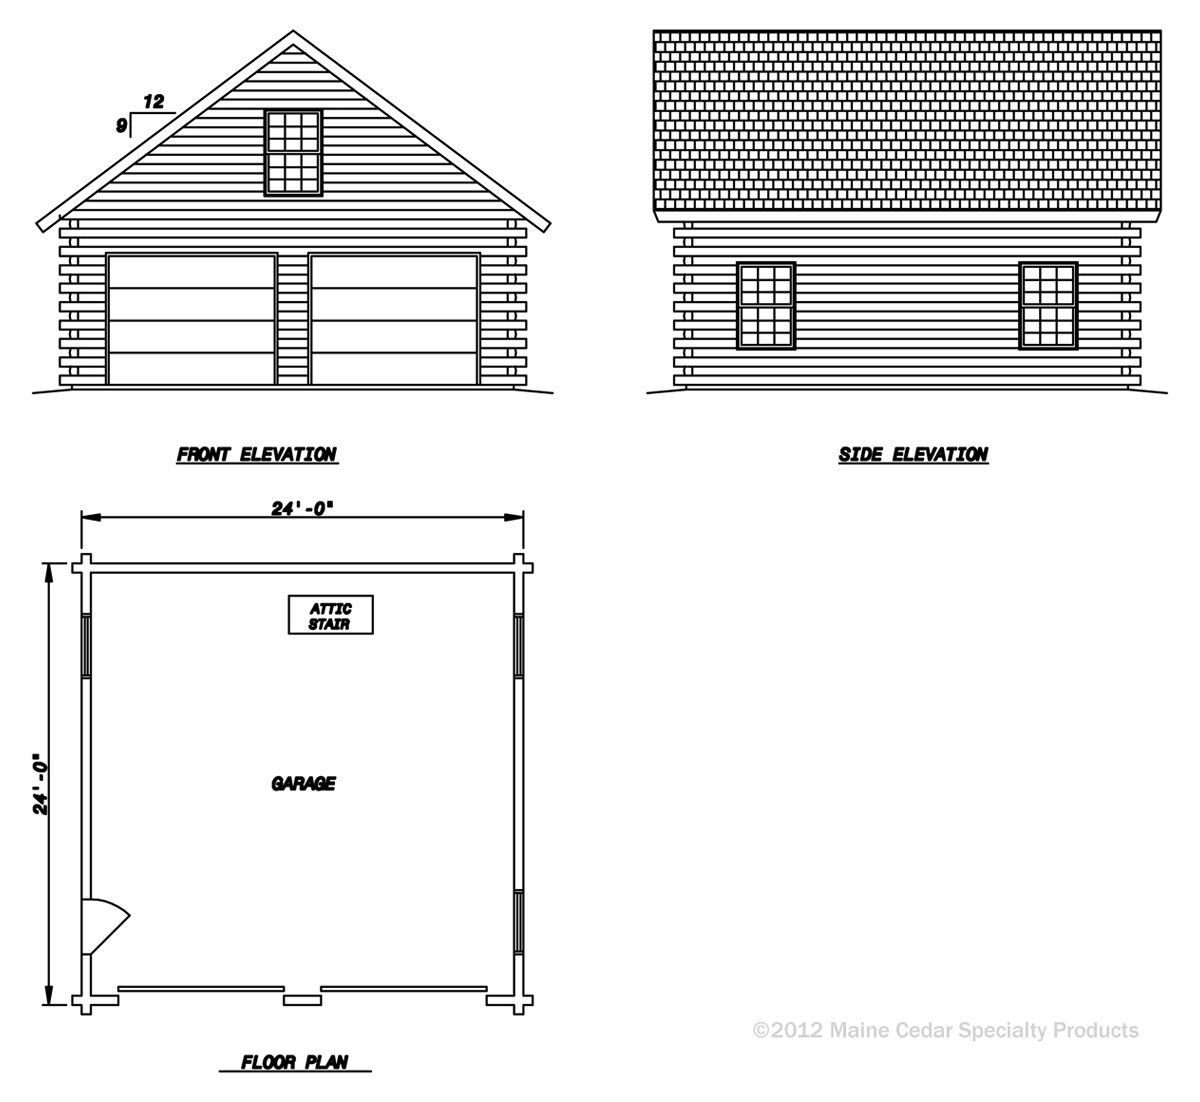 Double Garage Design In Sidcup: Double Garage With Loft Cedar Log Garage